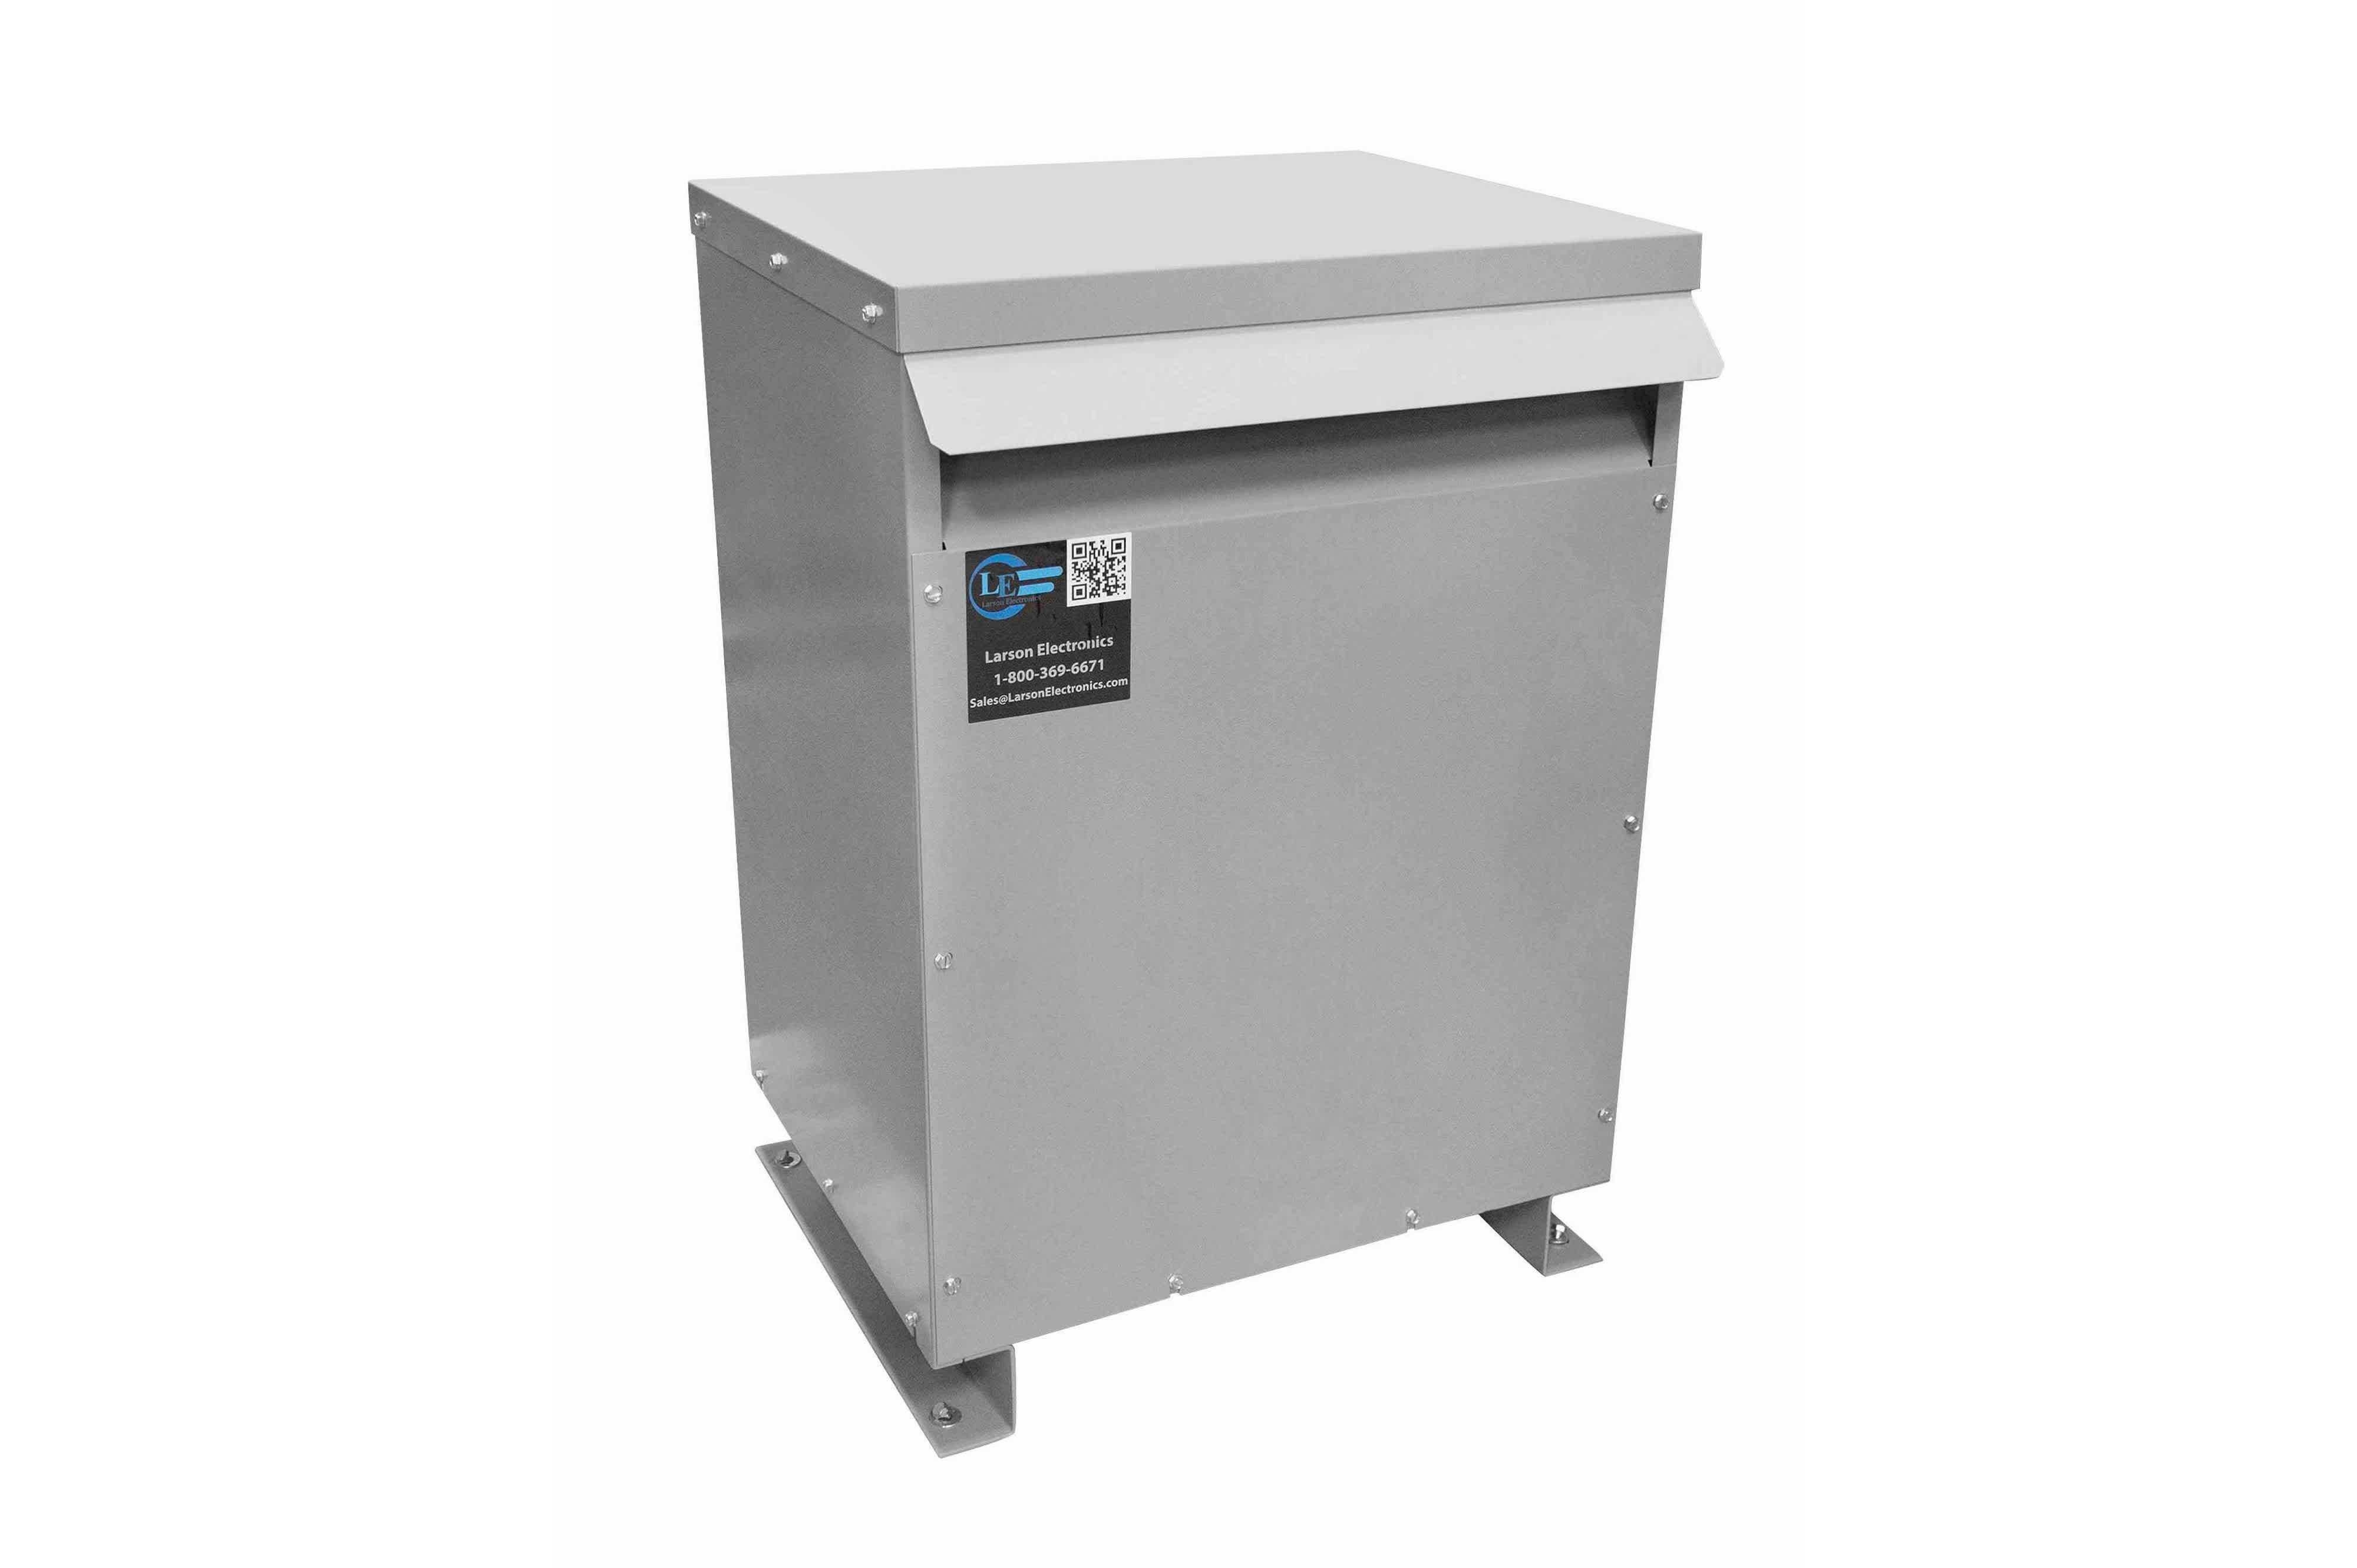 38 kVA 3PH Isolation Transformer, 600V Wye Primary, 400Y/231 Wye-N Secondary, N3R, Ventilated, 60 Hz